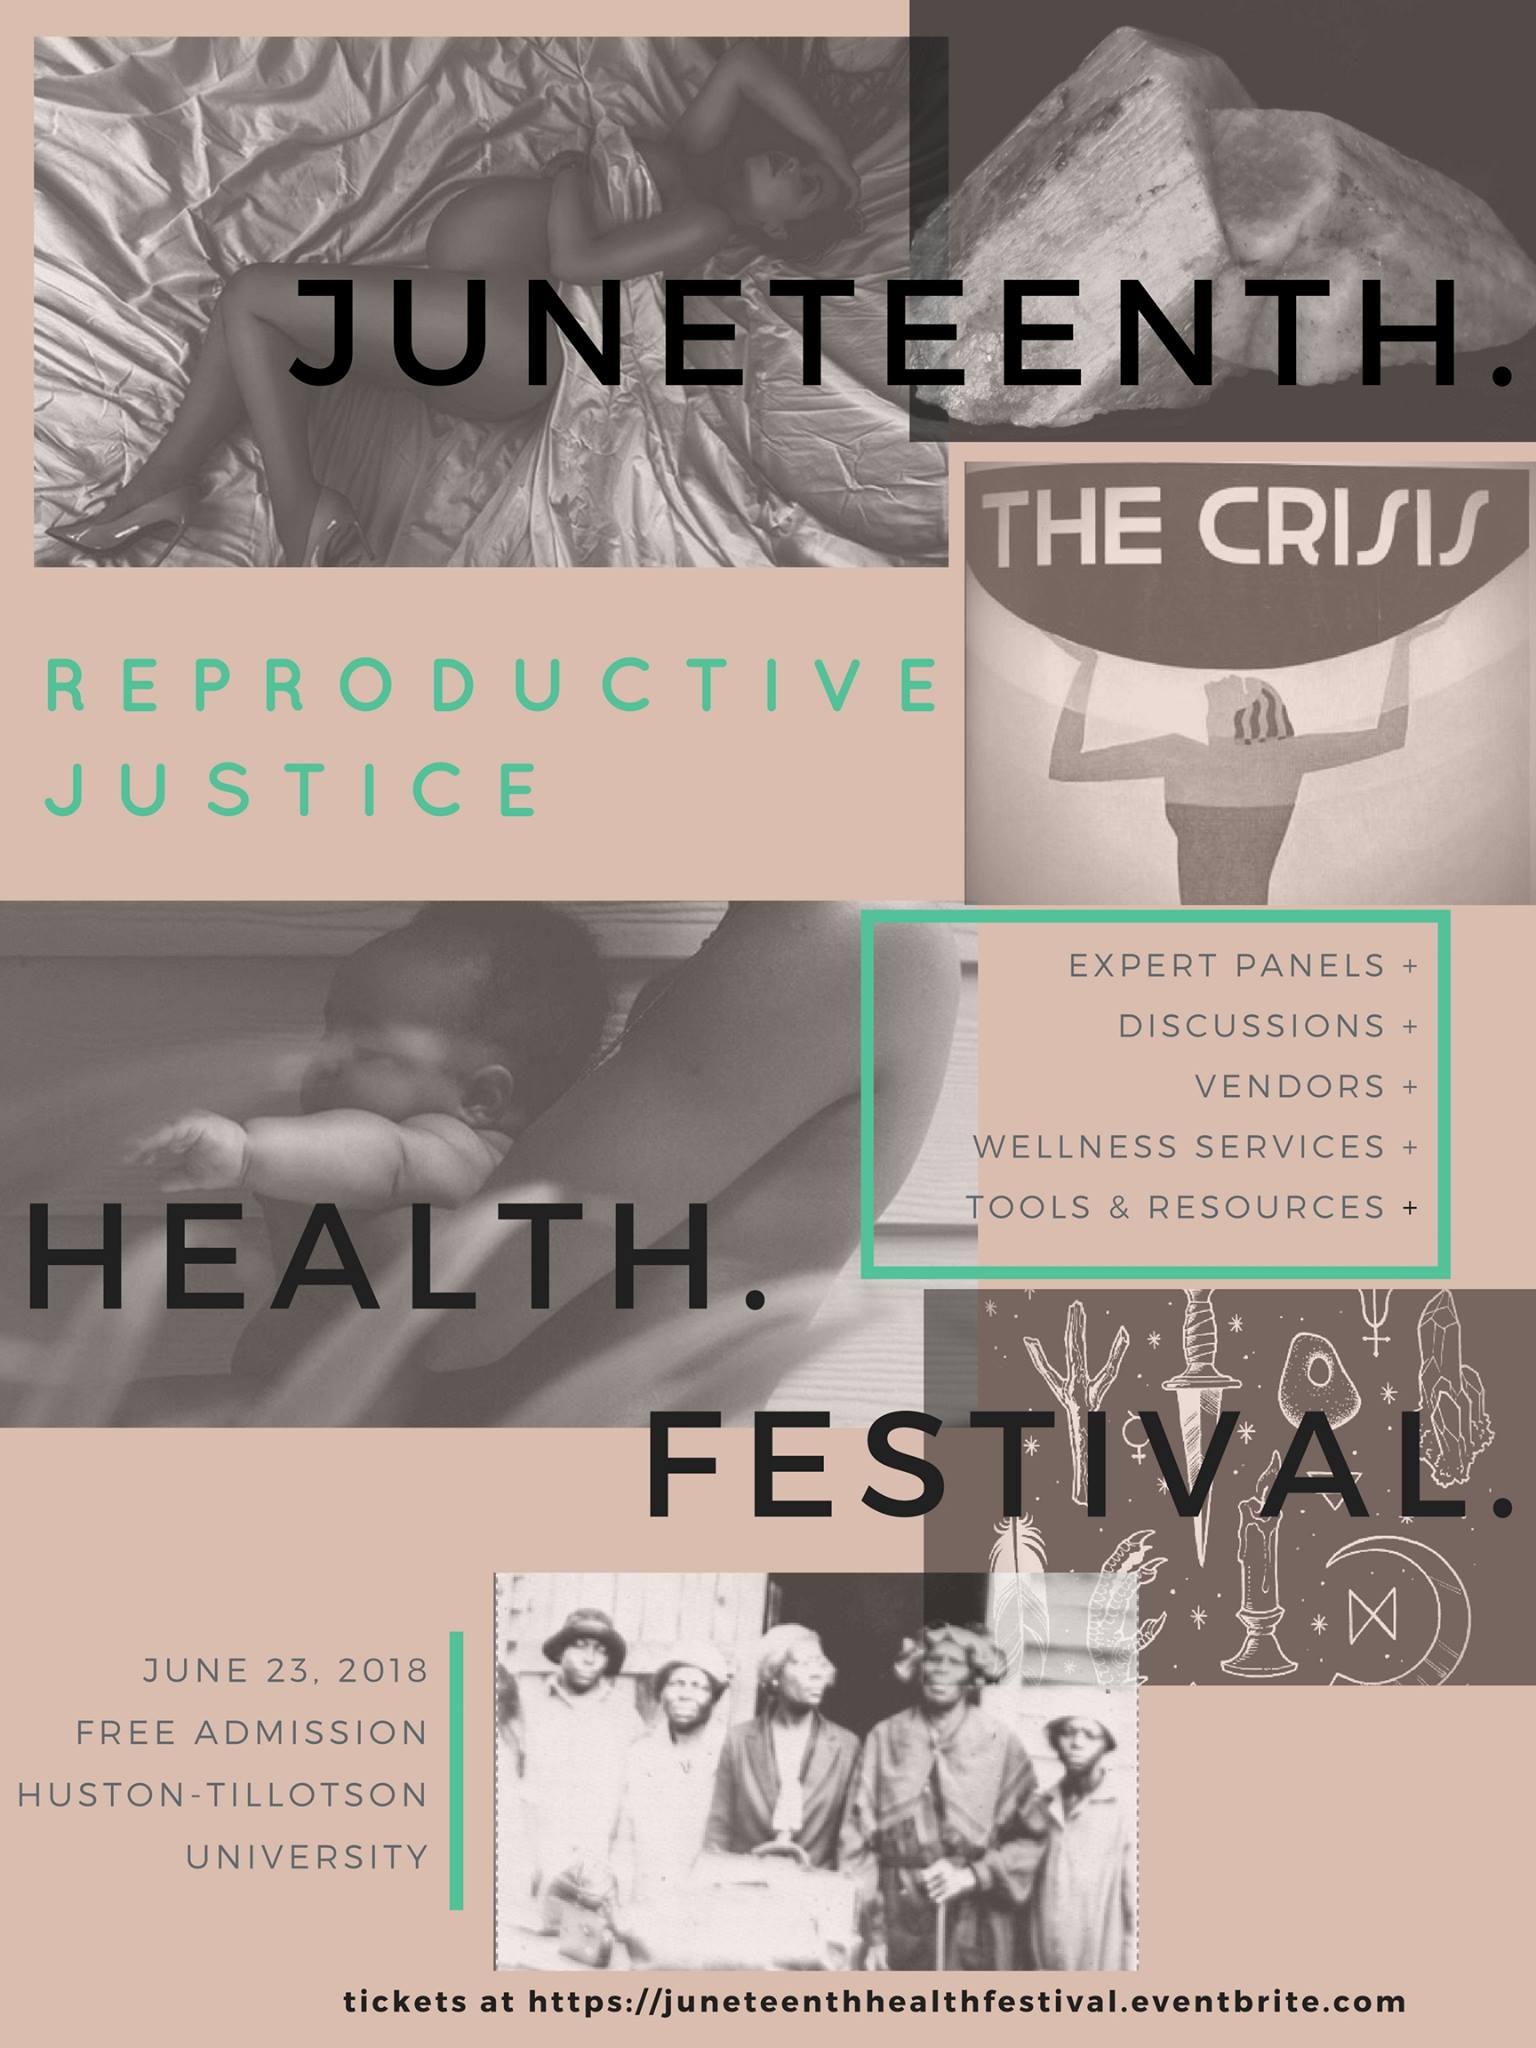 Juneteenth Health Fest - Ufulu Child